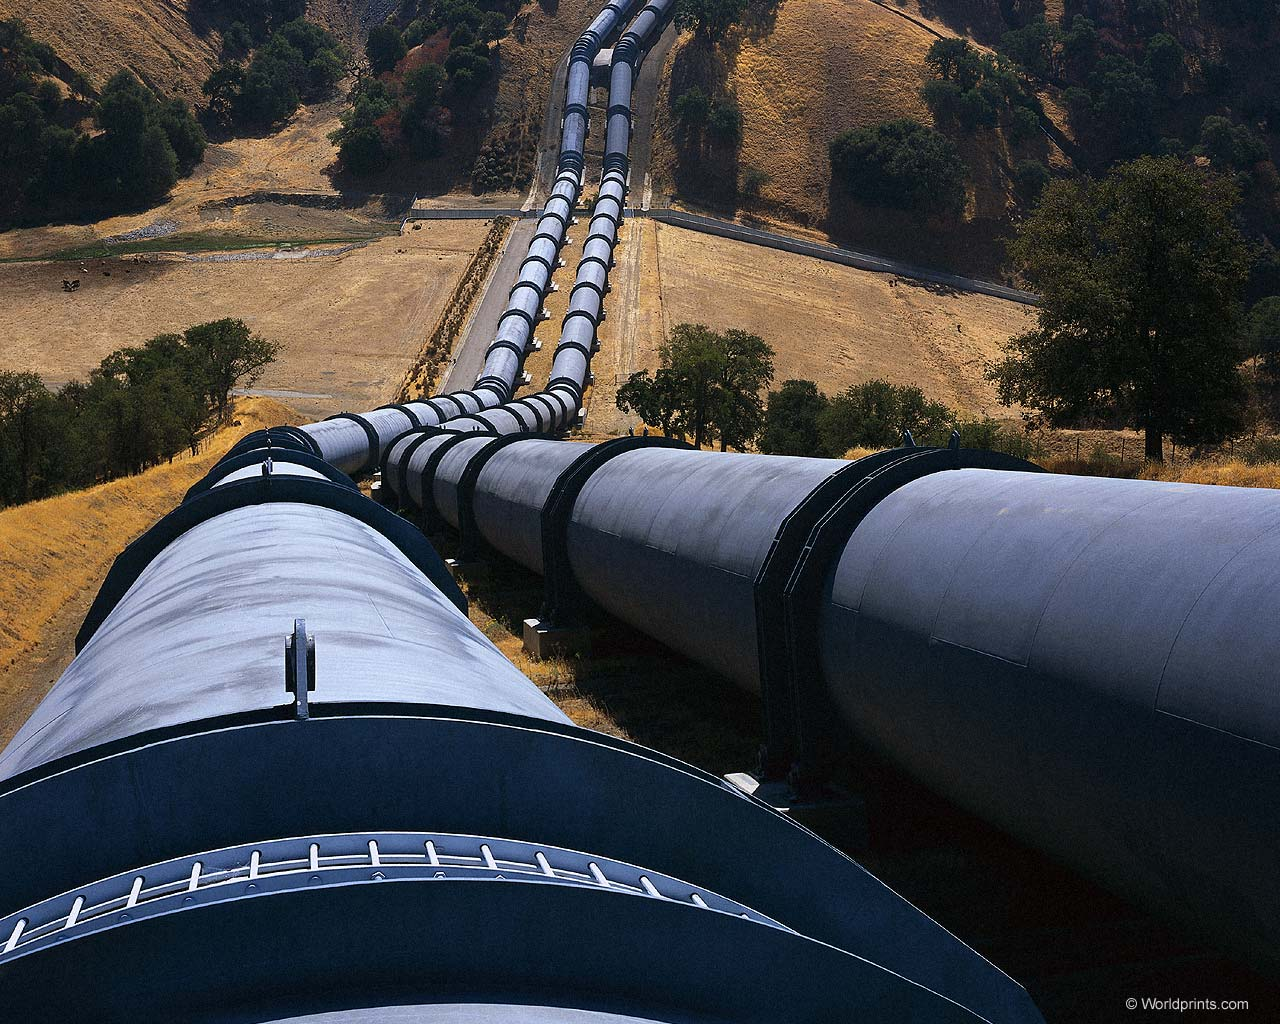 Пошлина на экспорт нефти из РФ с 1 апреля может вырасти на 2,6 долл США